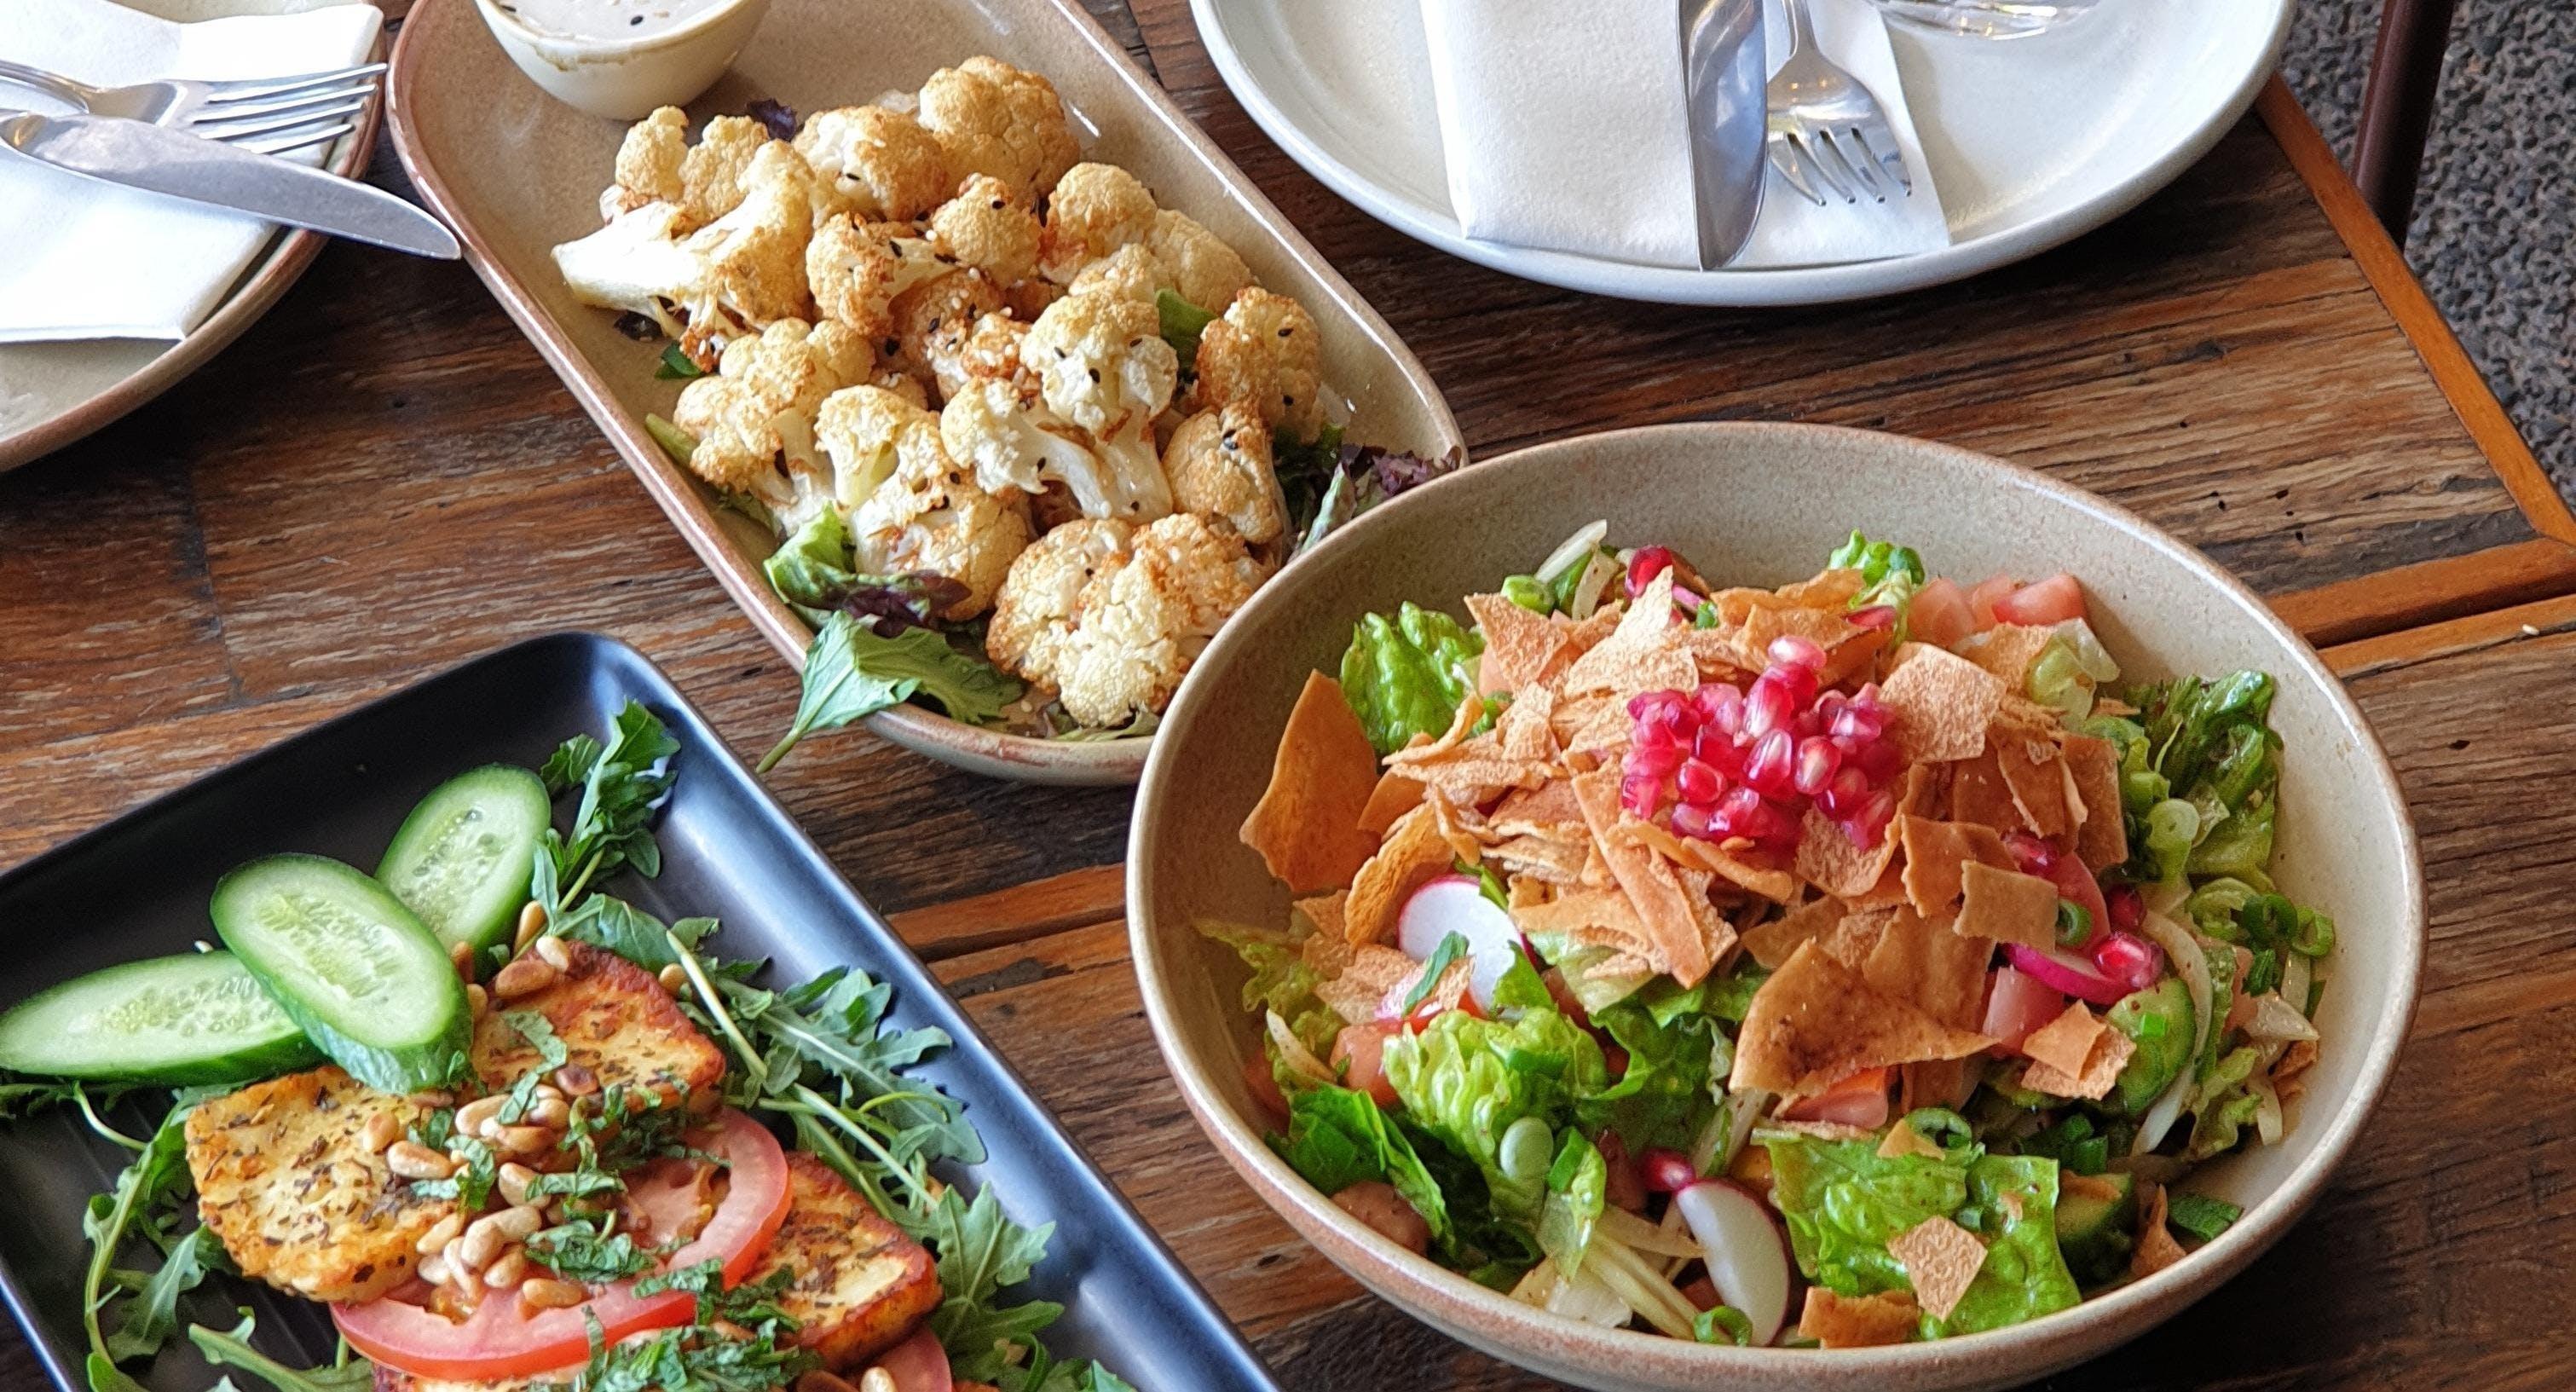 Photo of restaurant Baba Ghanouj - Parramatta in Parramatta, Sydney